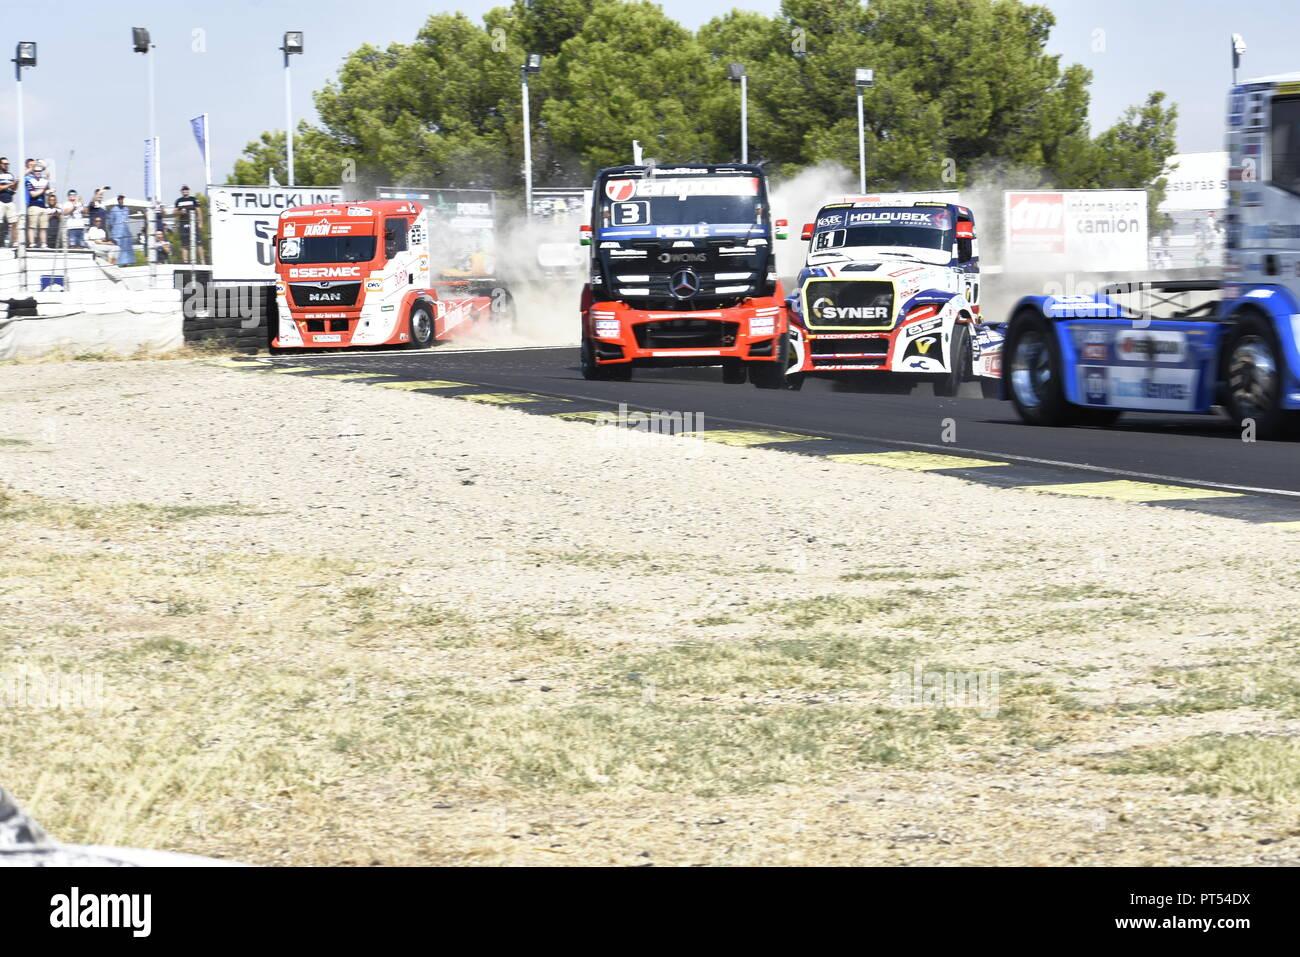 Madrid, Spain  6th Oct 2018  Permanent circuit of Jarama